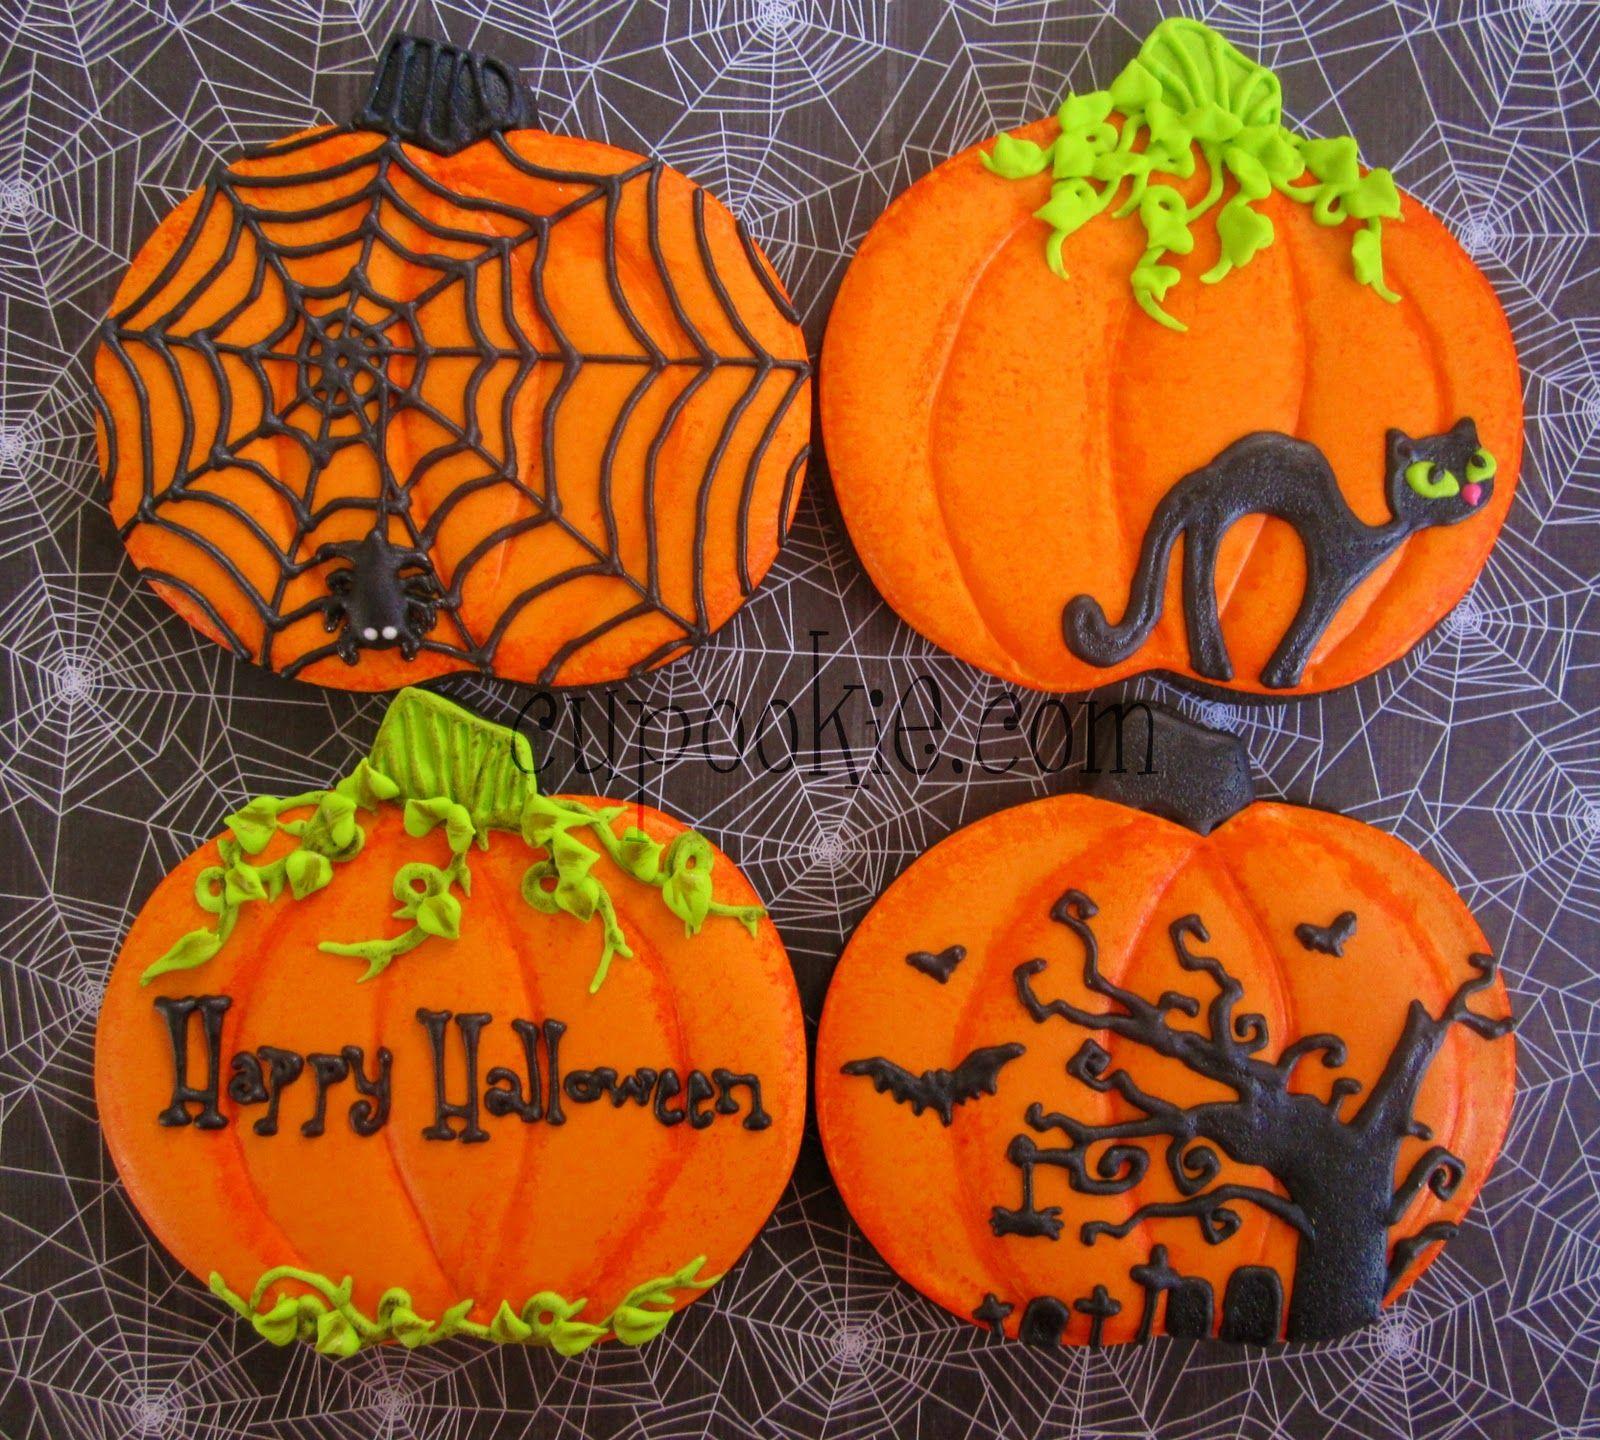 #halloweencookiesdecorated